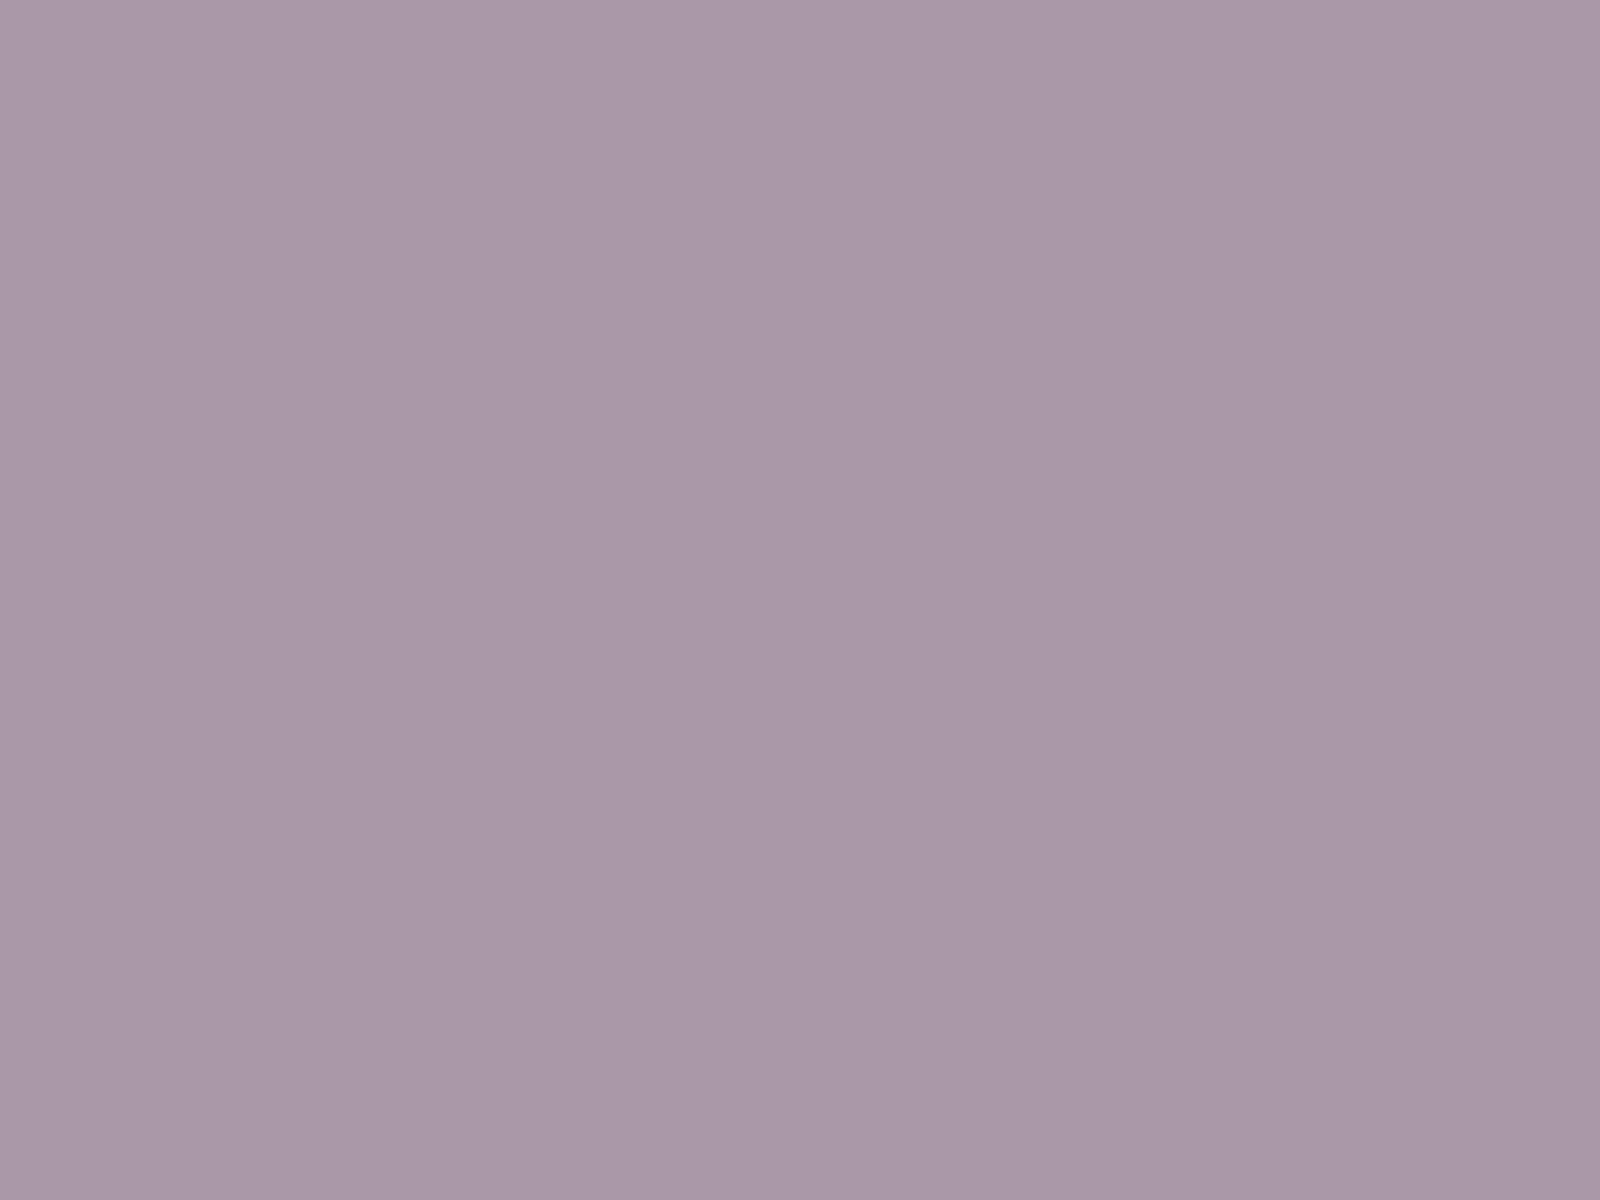 1600x1200 Rose Quartz Solid Color Background